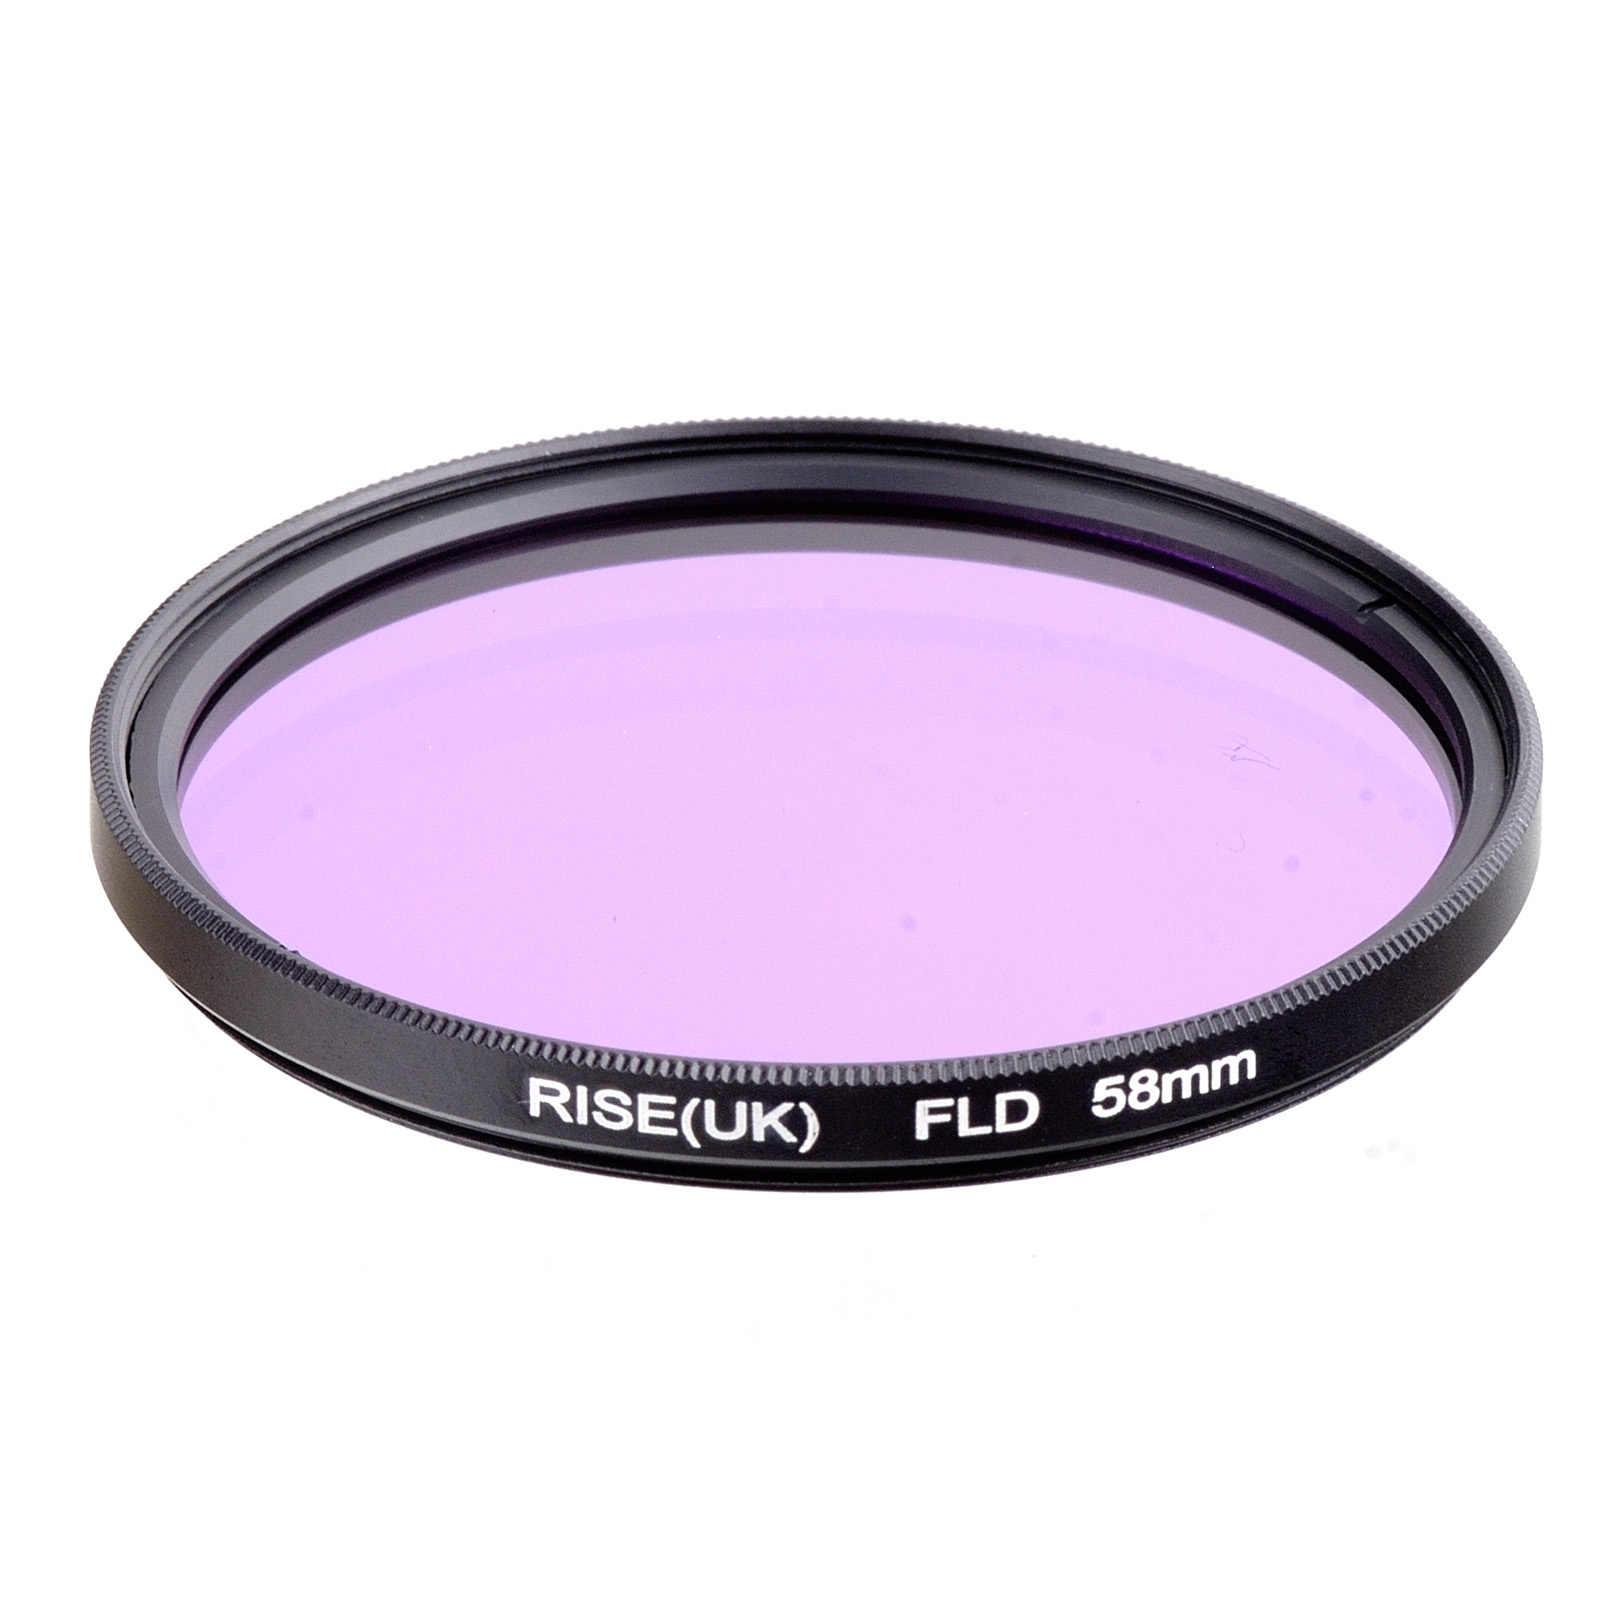 Naik (Inggris) Baru 58 Mm FLD Filter Lensa untuk Nikon Canon Sony Kamera Dlsr Filter